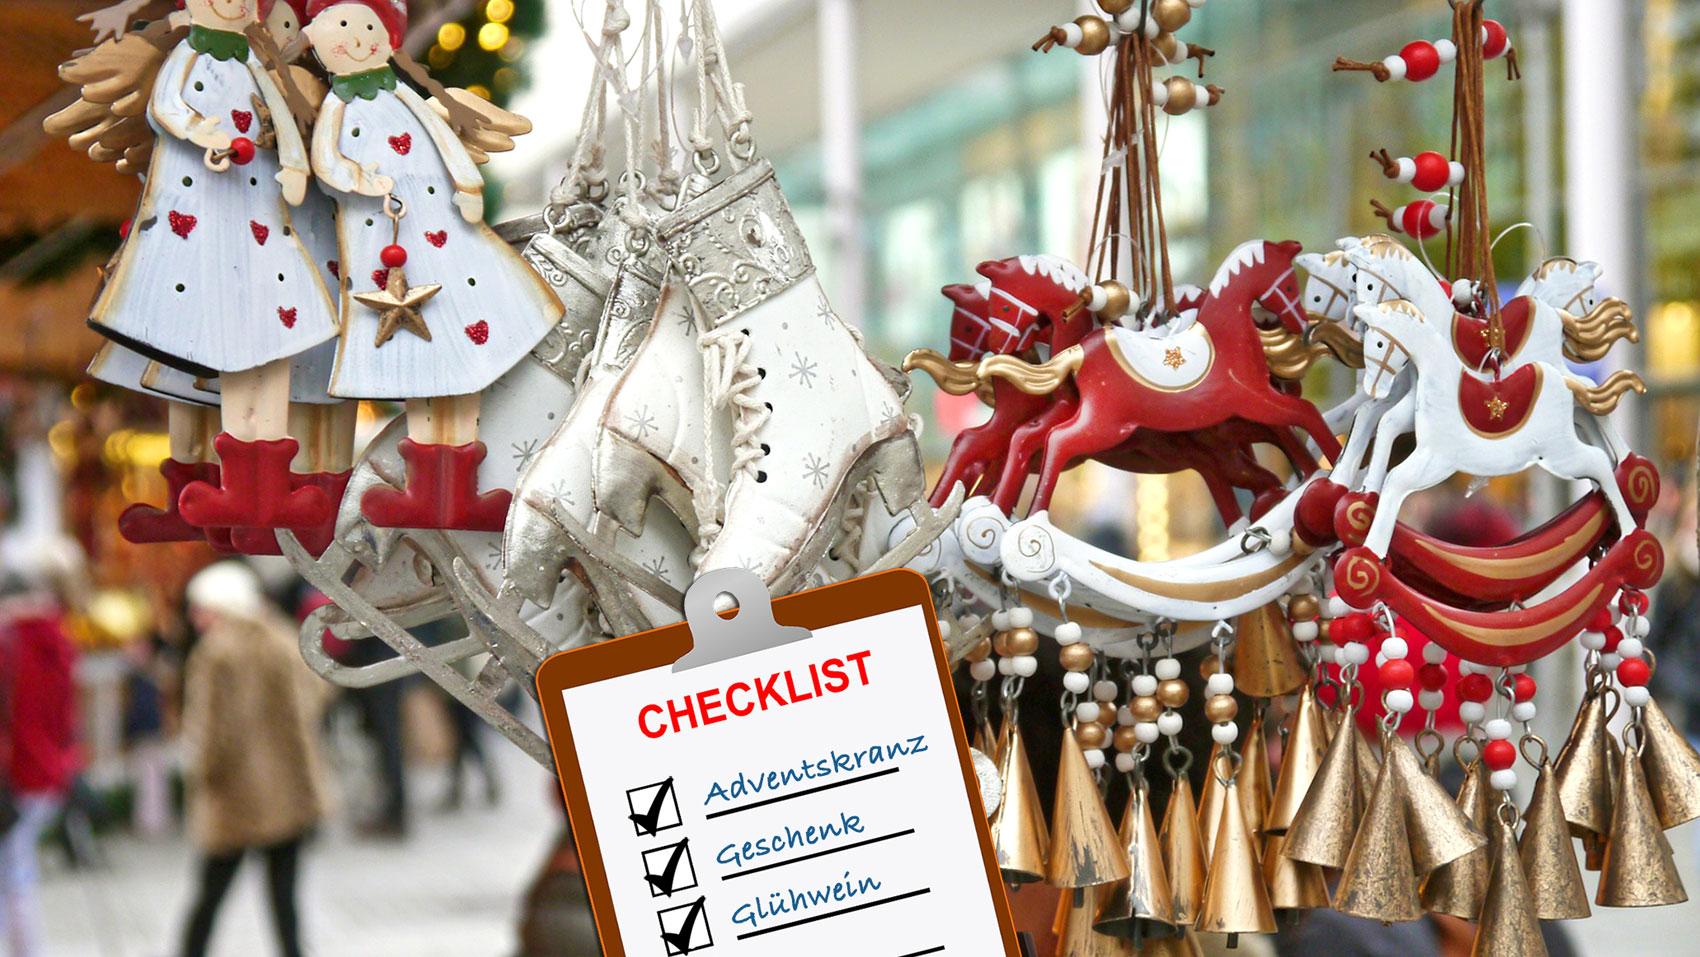 Alles an Bord? Die große Weihnachts-Checkliste | ideas in boxes Blog